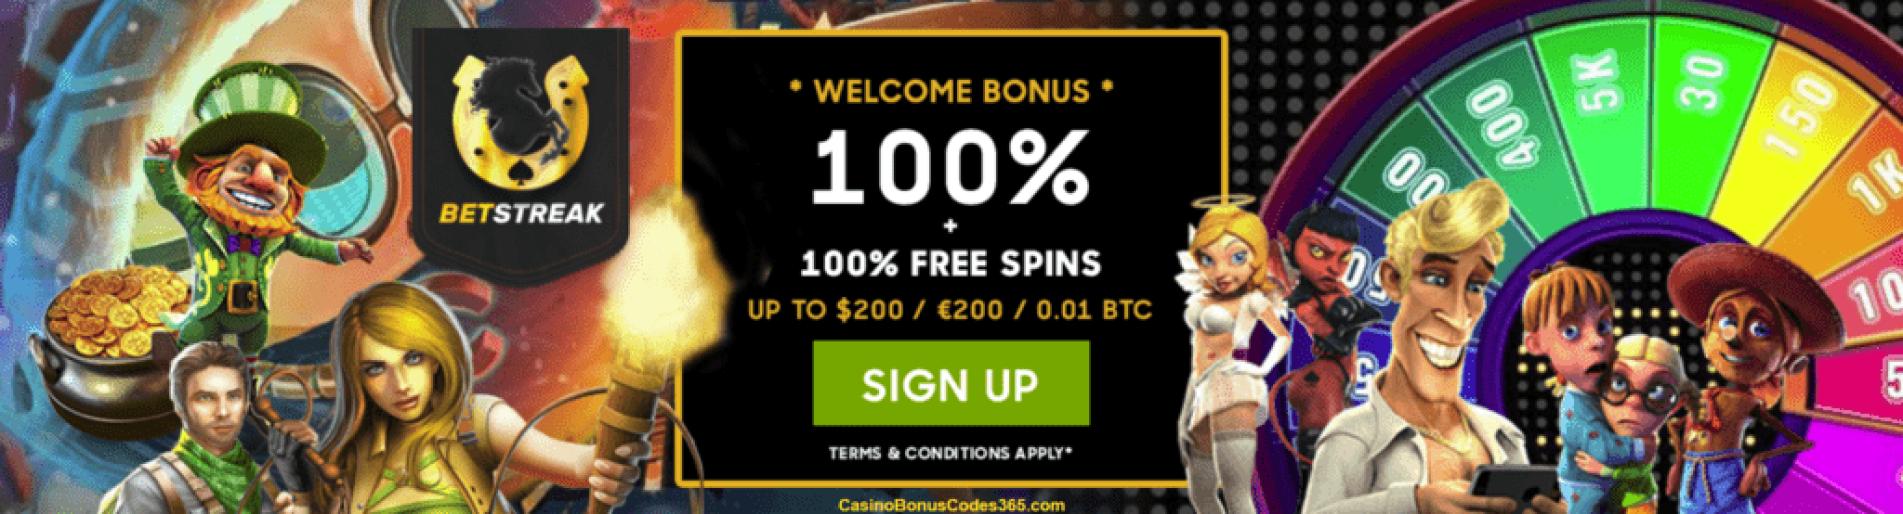 Casino bitcoin deposit free Stes